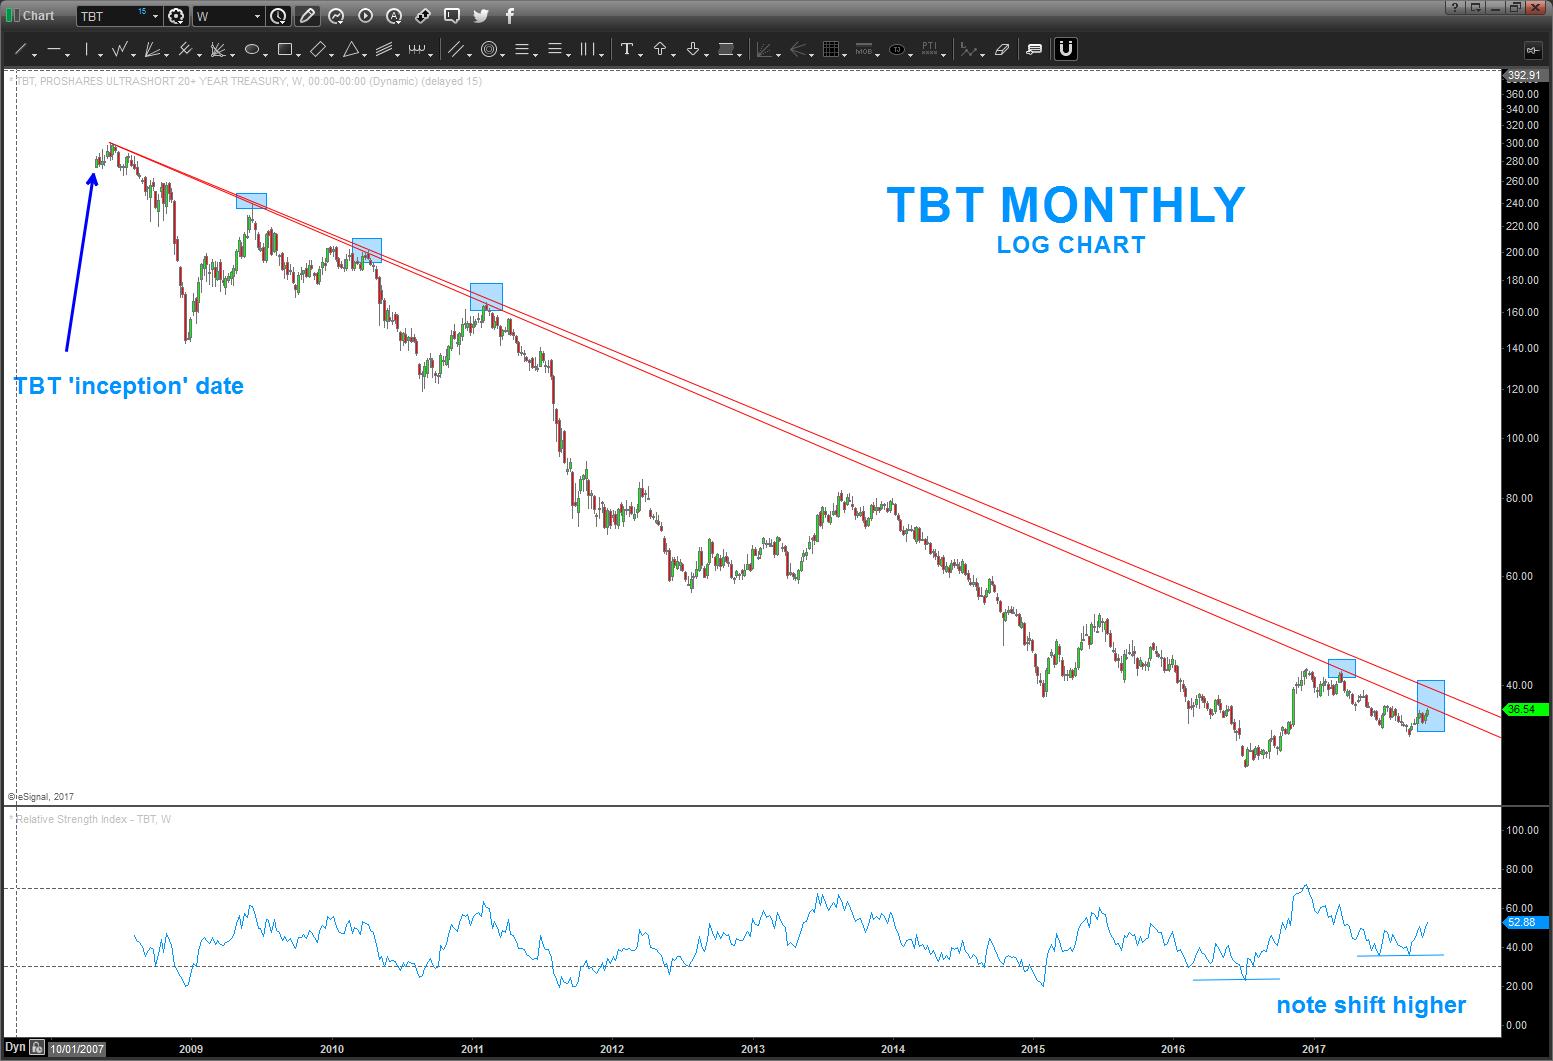 tbt short treasury bonds down trend line resistance